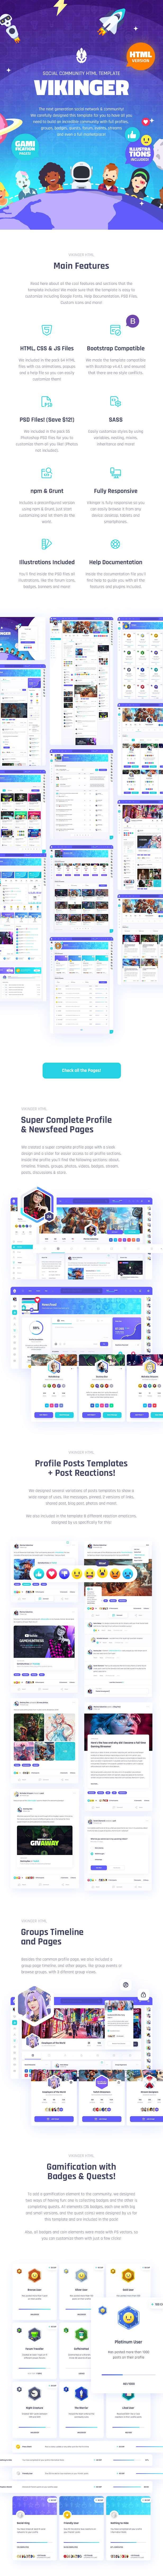 Vikinger - Social Community and Marketplace HTML Template - 9